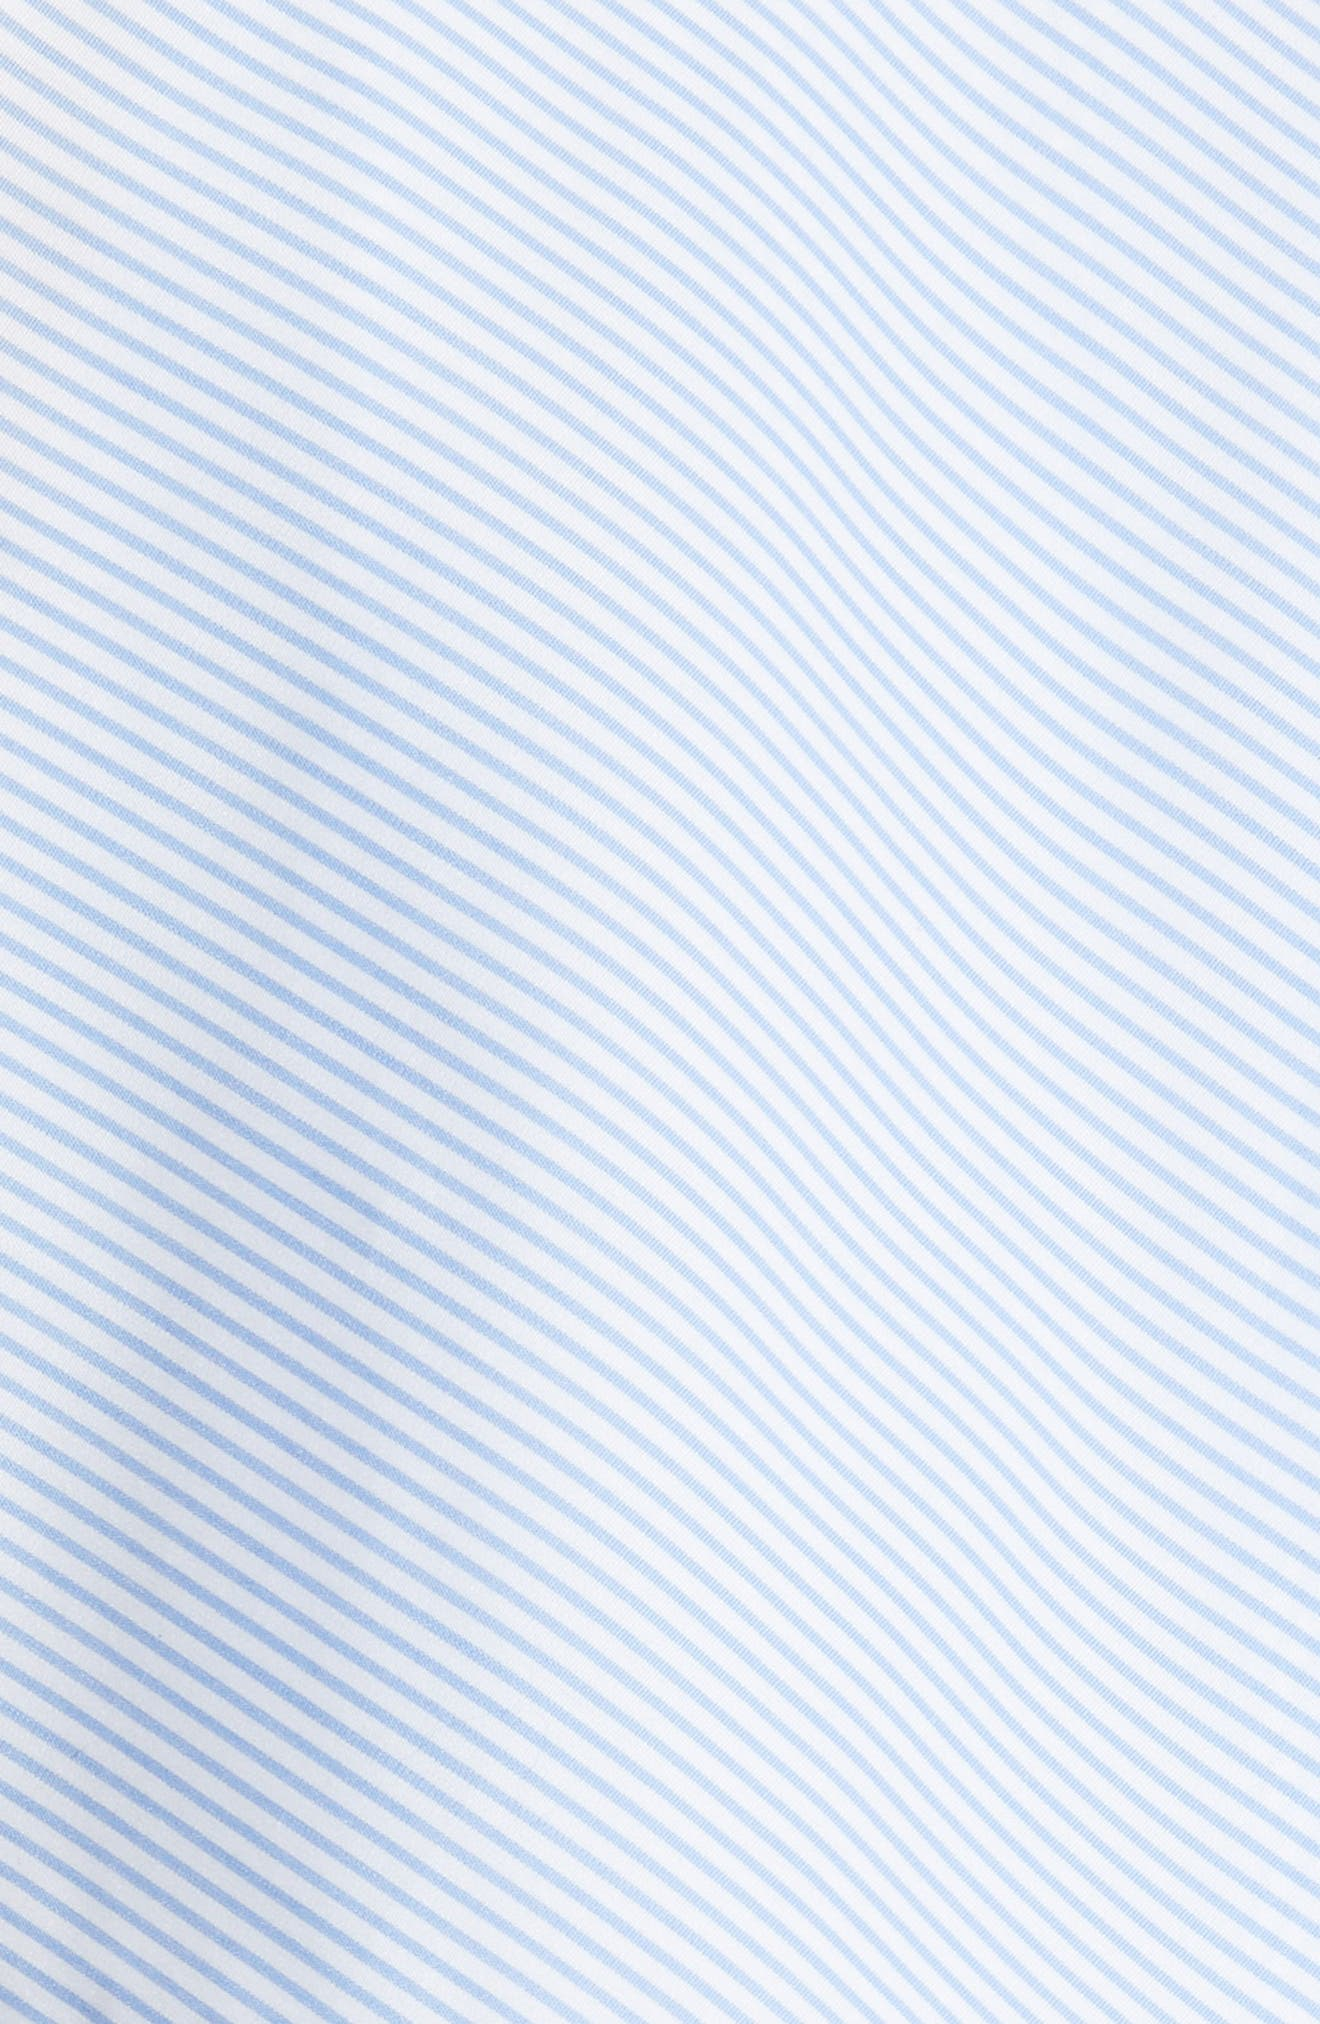 Adrie Ruffle Blouse,                             Alternate thumbnail 5, color,                             Light Blue Stripe